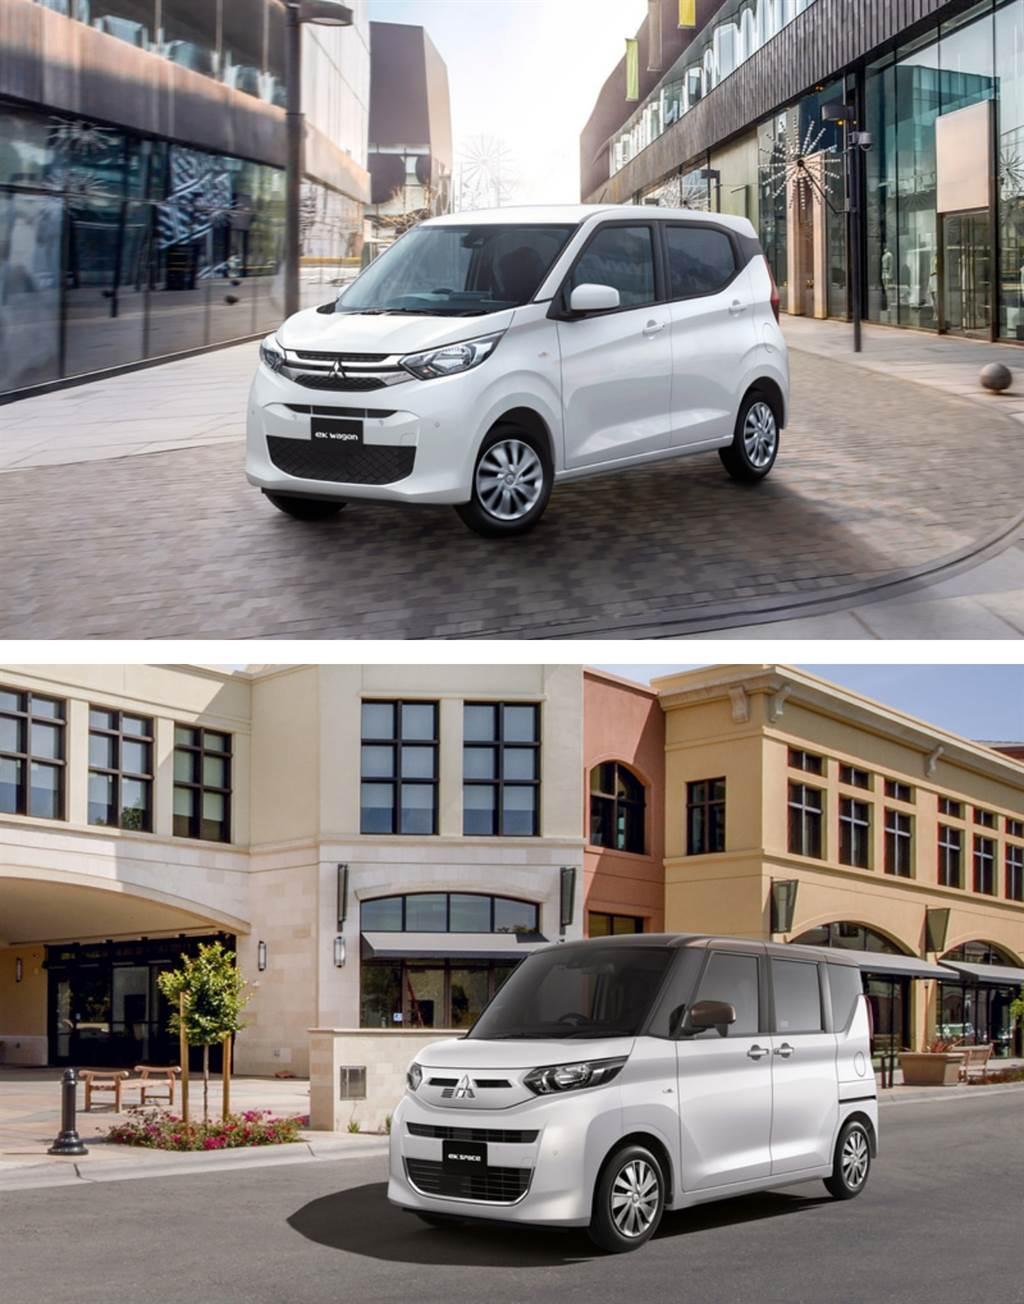 Nissan 與 Mitsubishi 合資公司 NMKV 慶祝 10 週年、未來導入新型純電輕自動車生產!